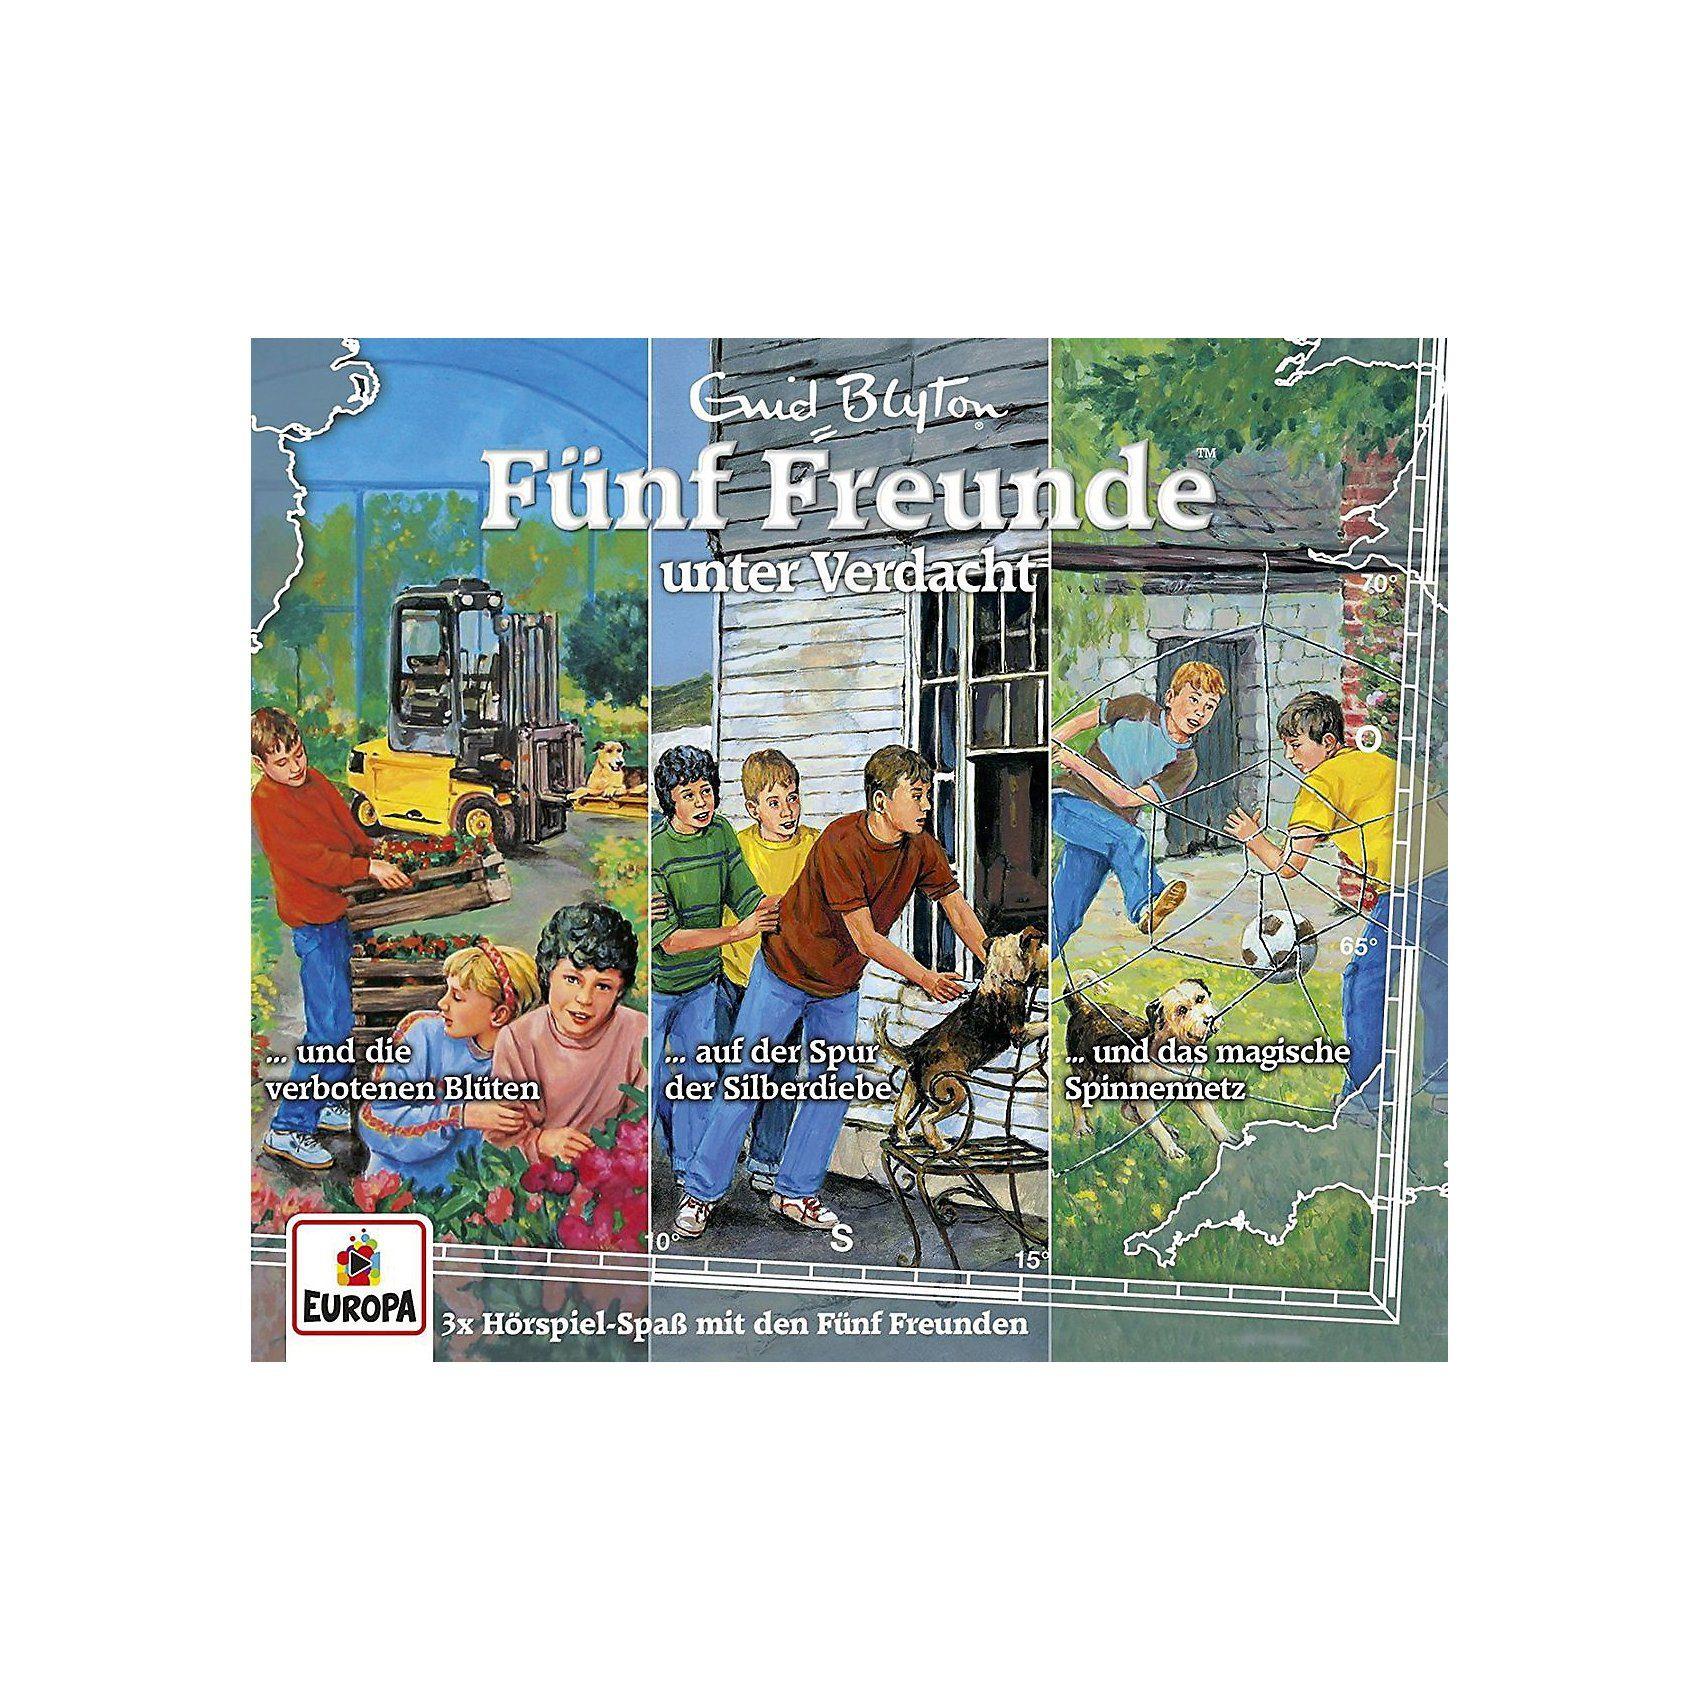 Sony CD Fünf Freunde 28 - 3er CD-Box- Fünf Freunde unter Verdacht